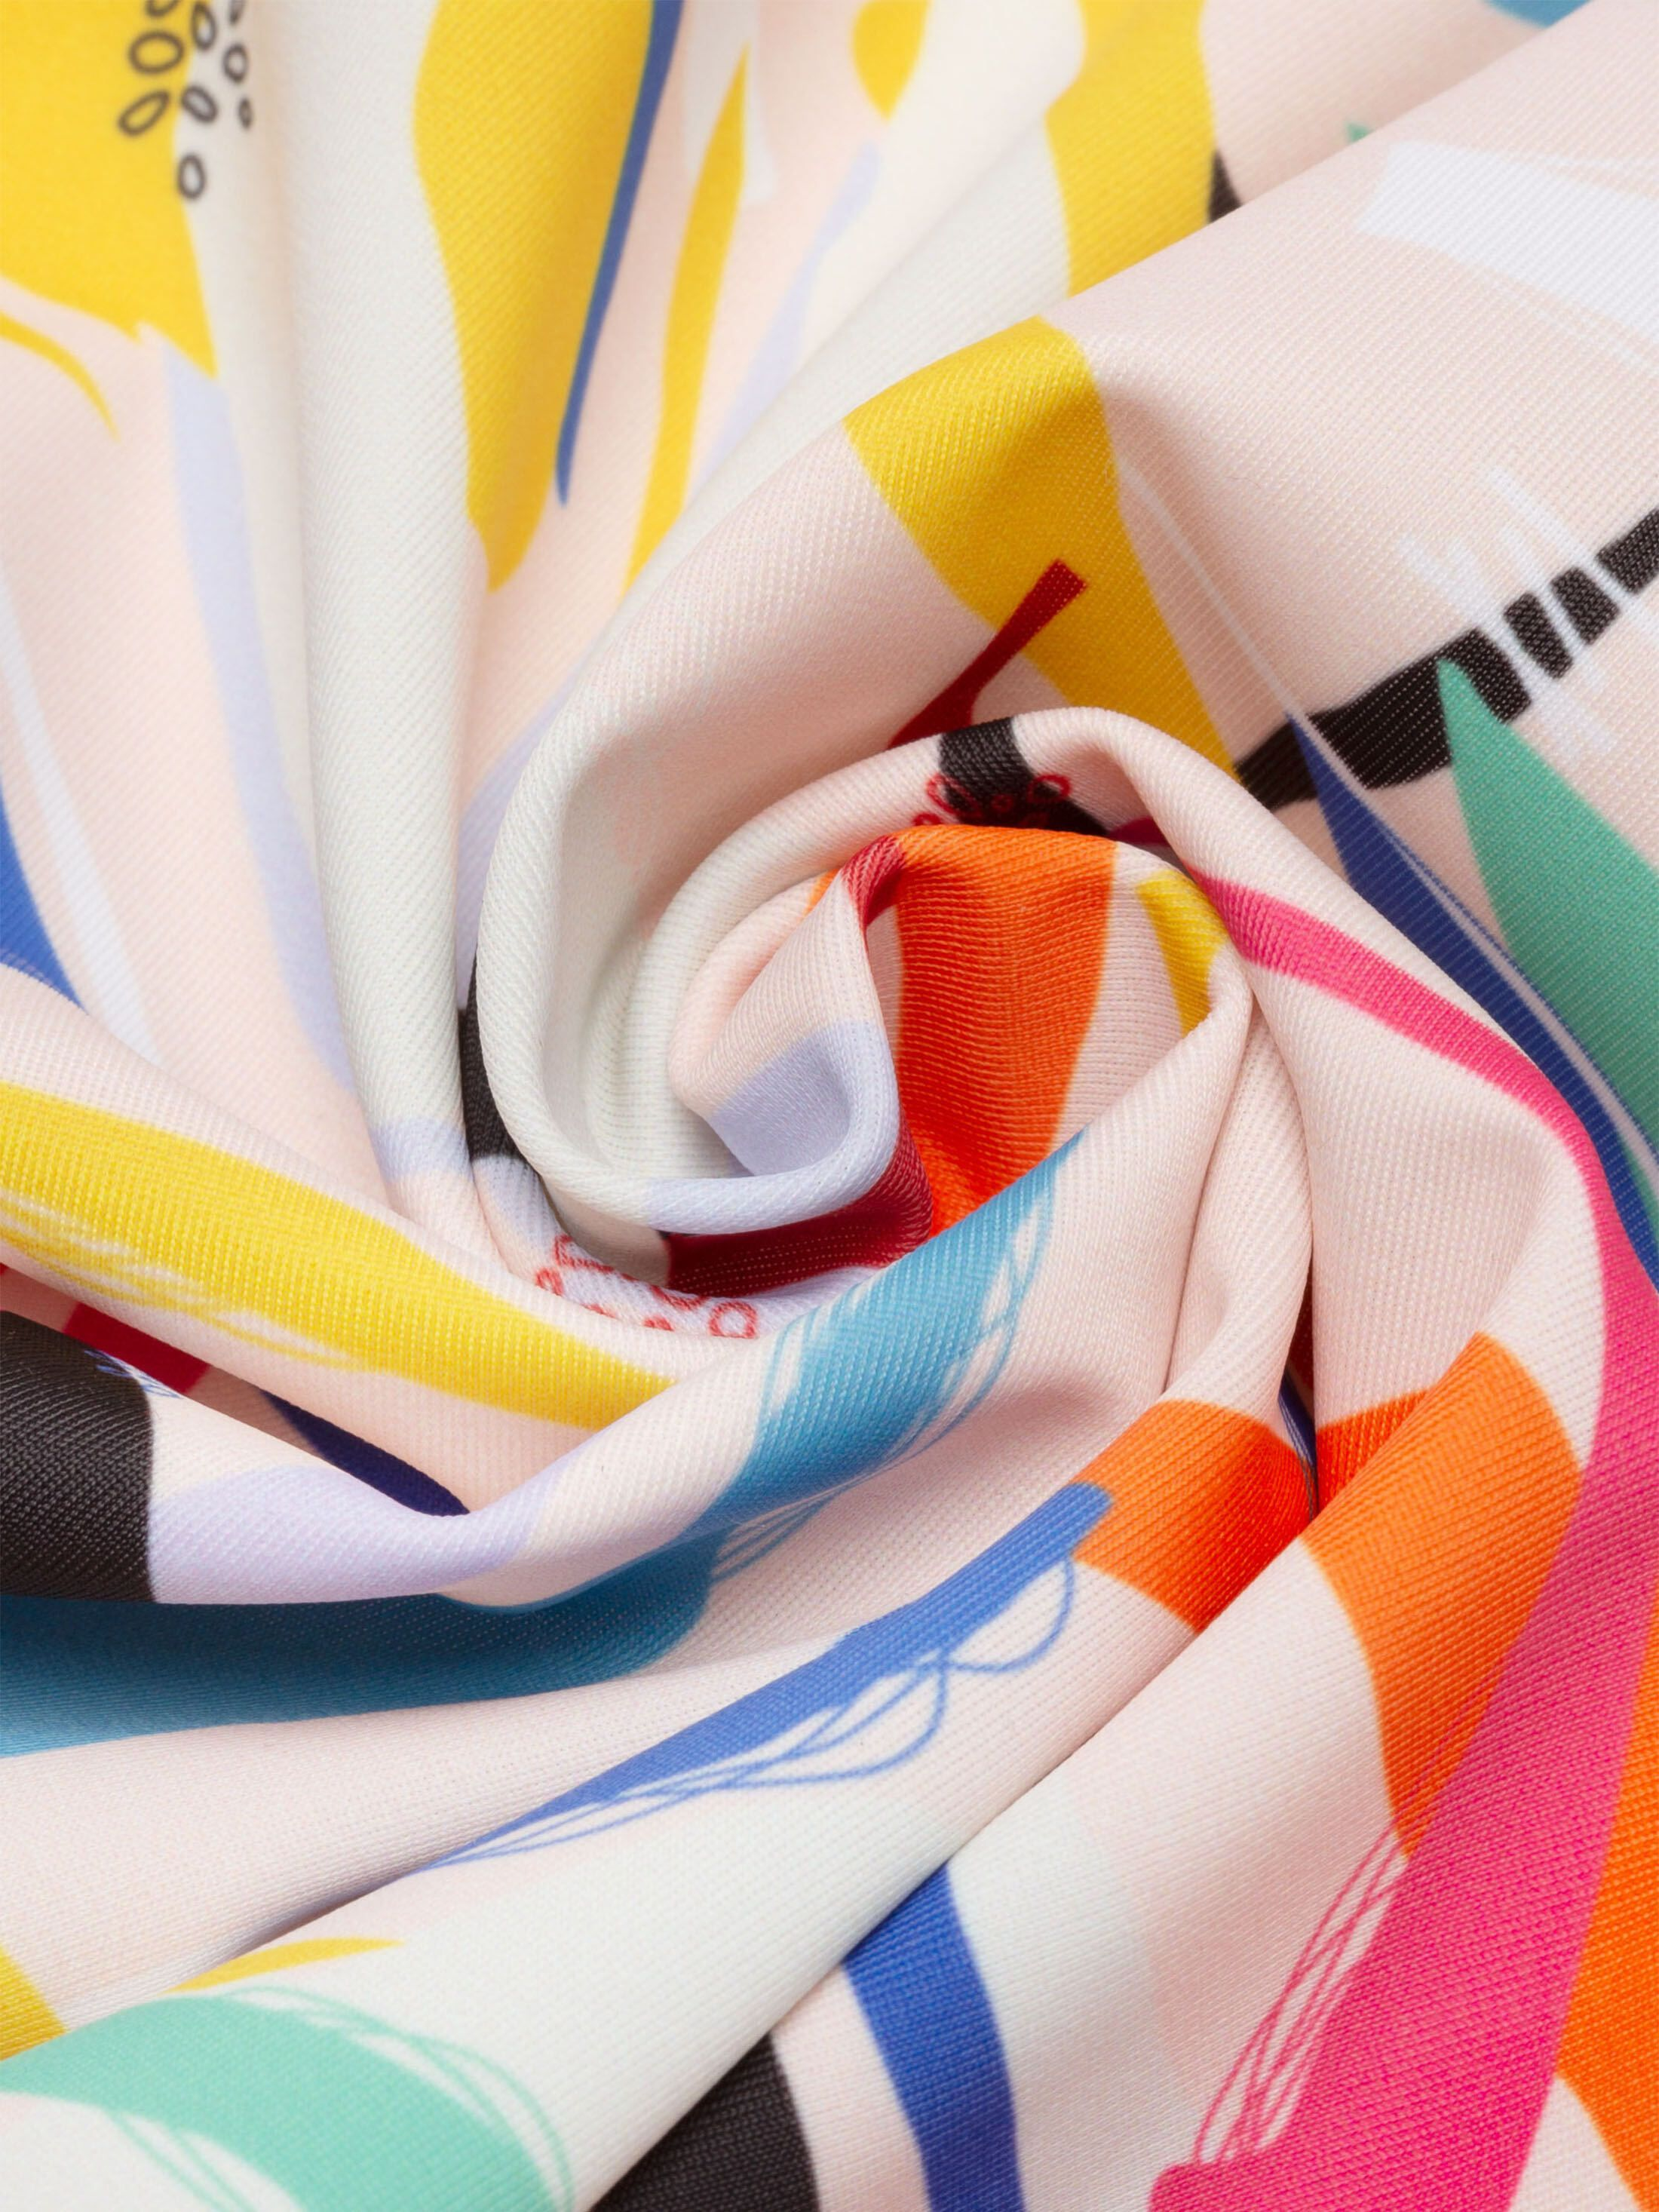 Impresión textil en lycra